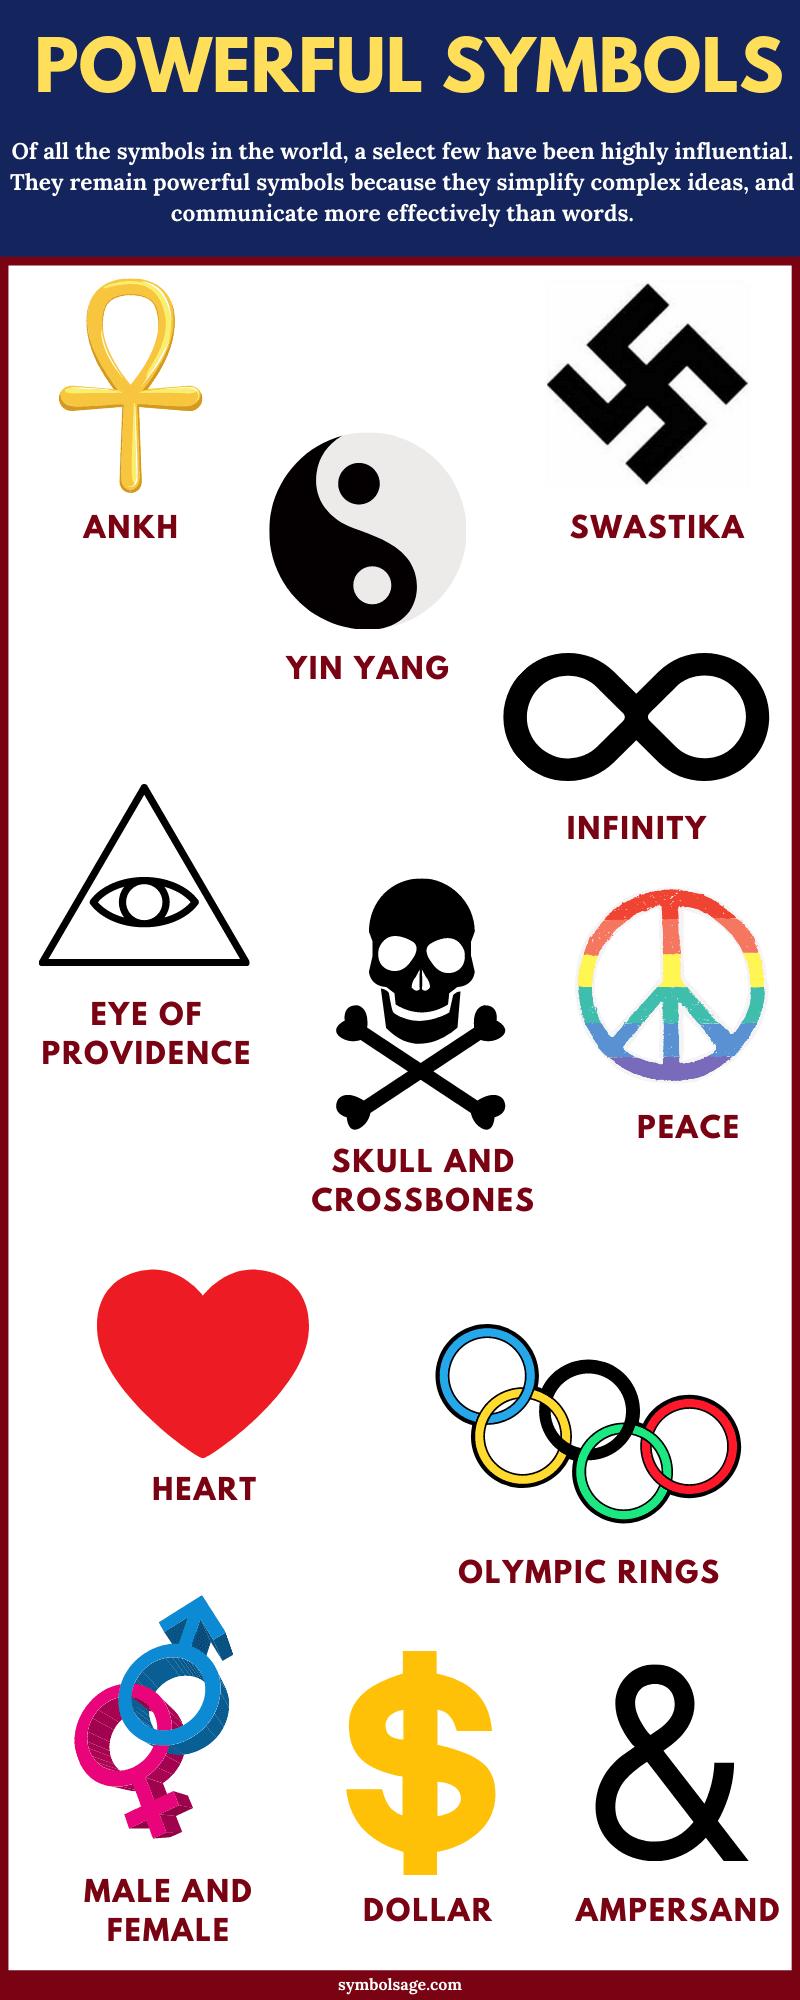 Powerful symbols